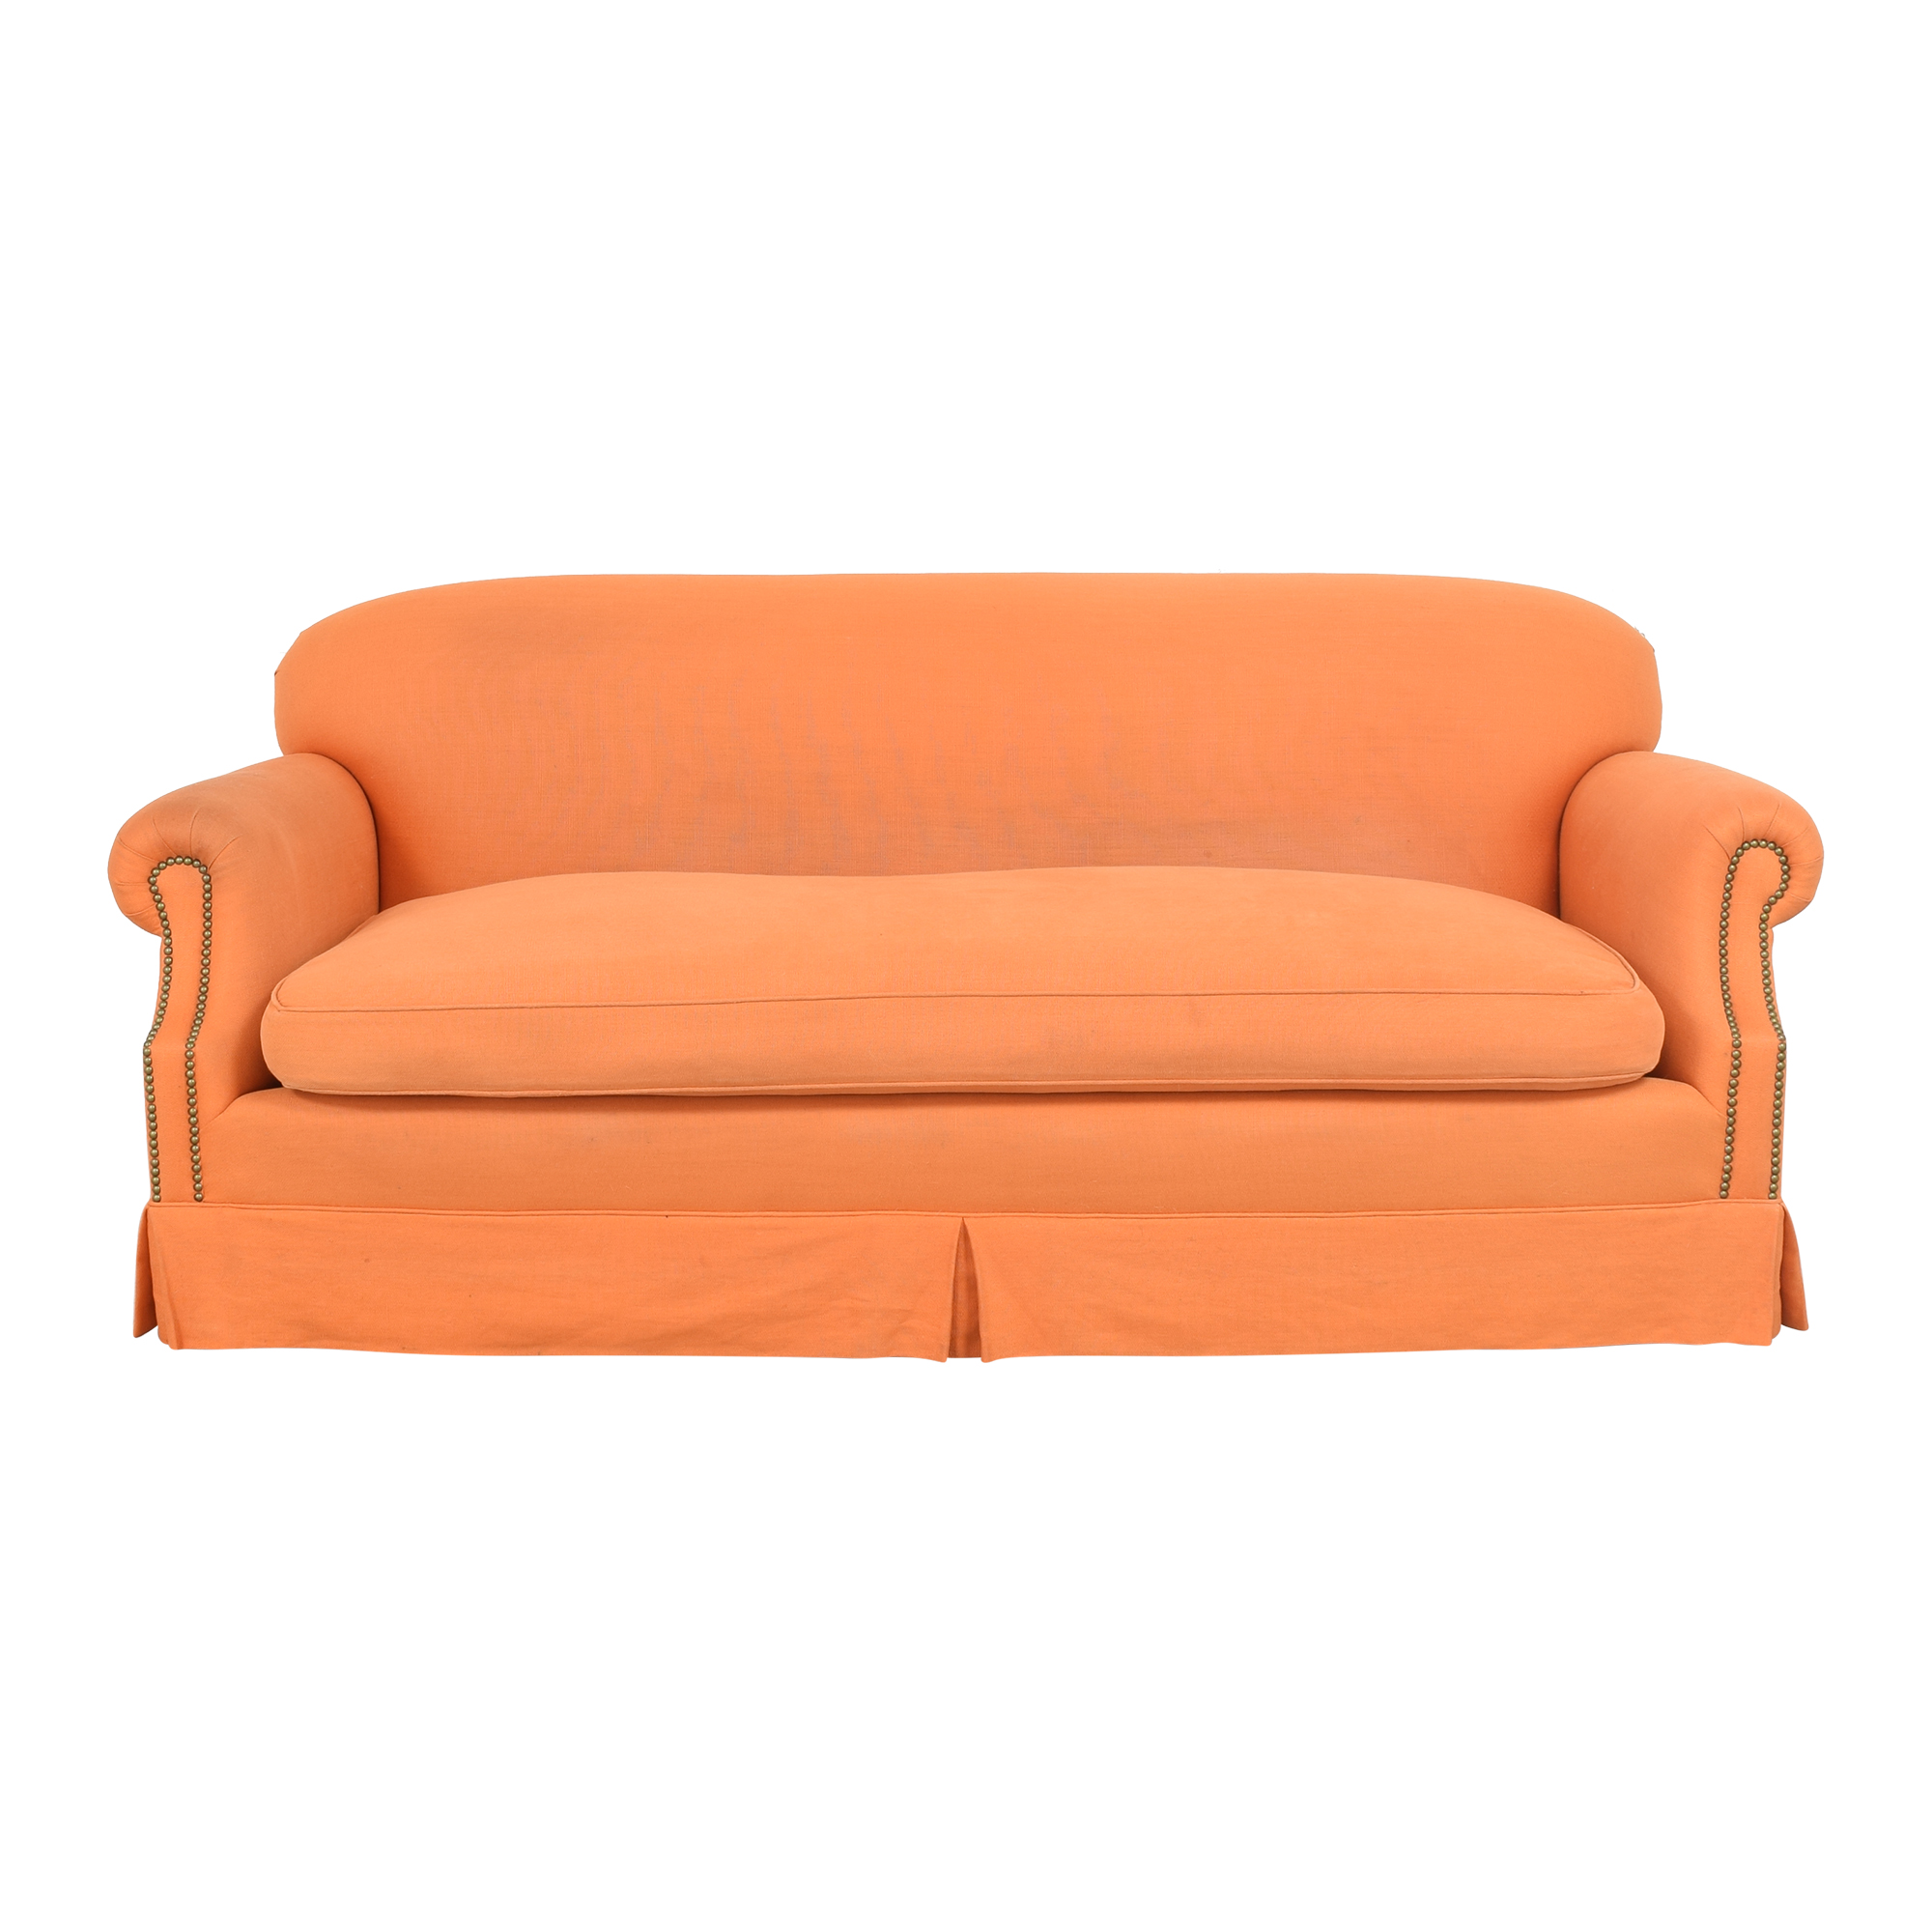 George Smith Bench Cushion Sofa George Smith